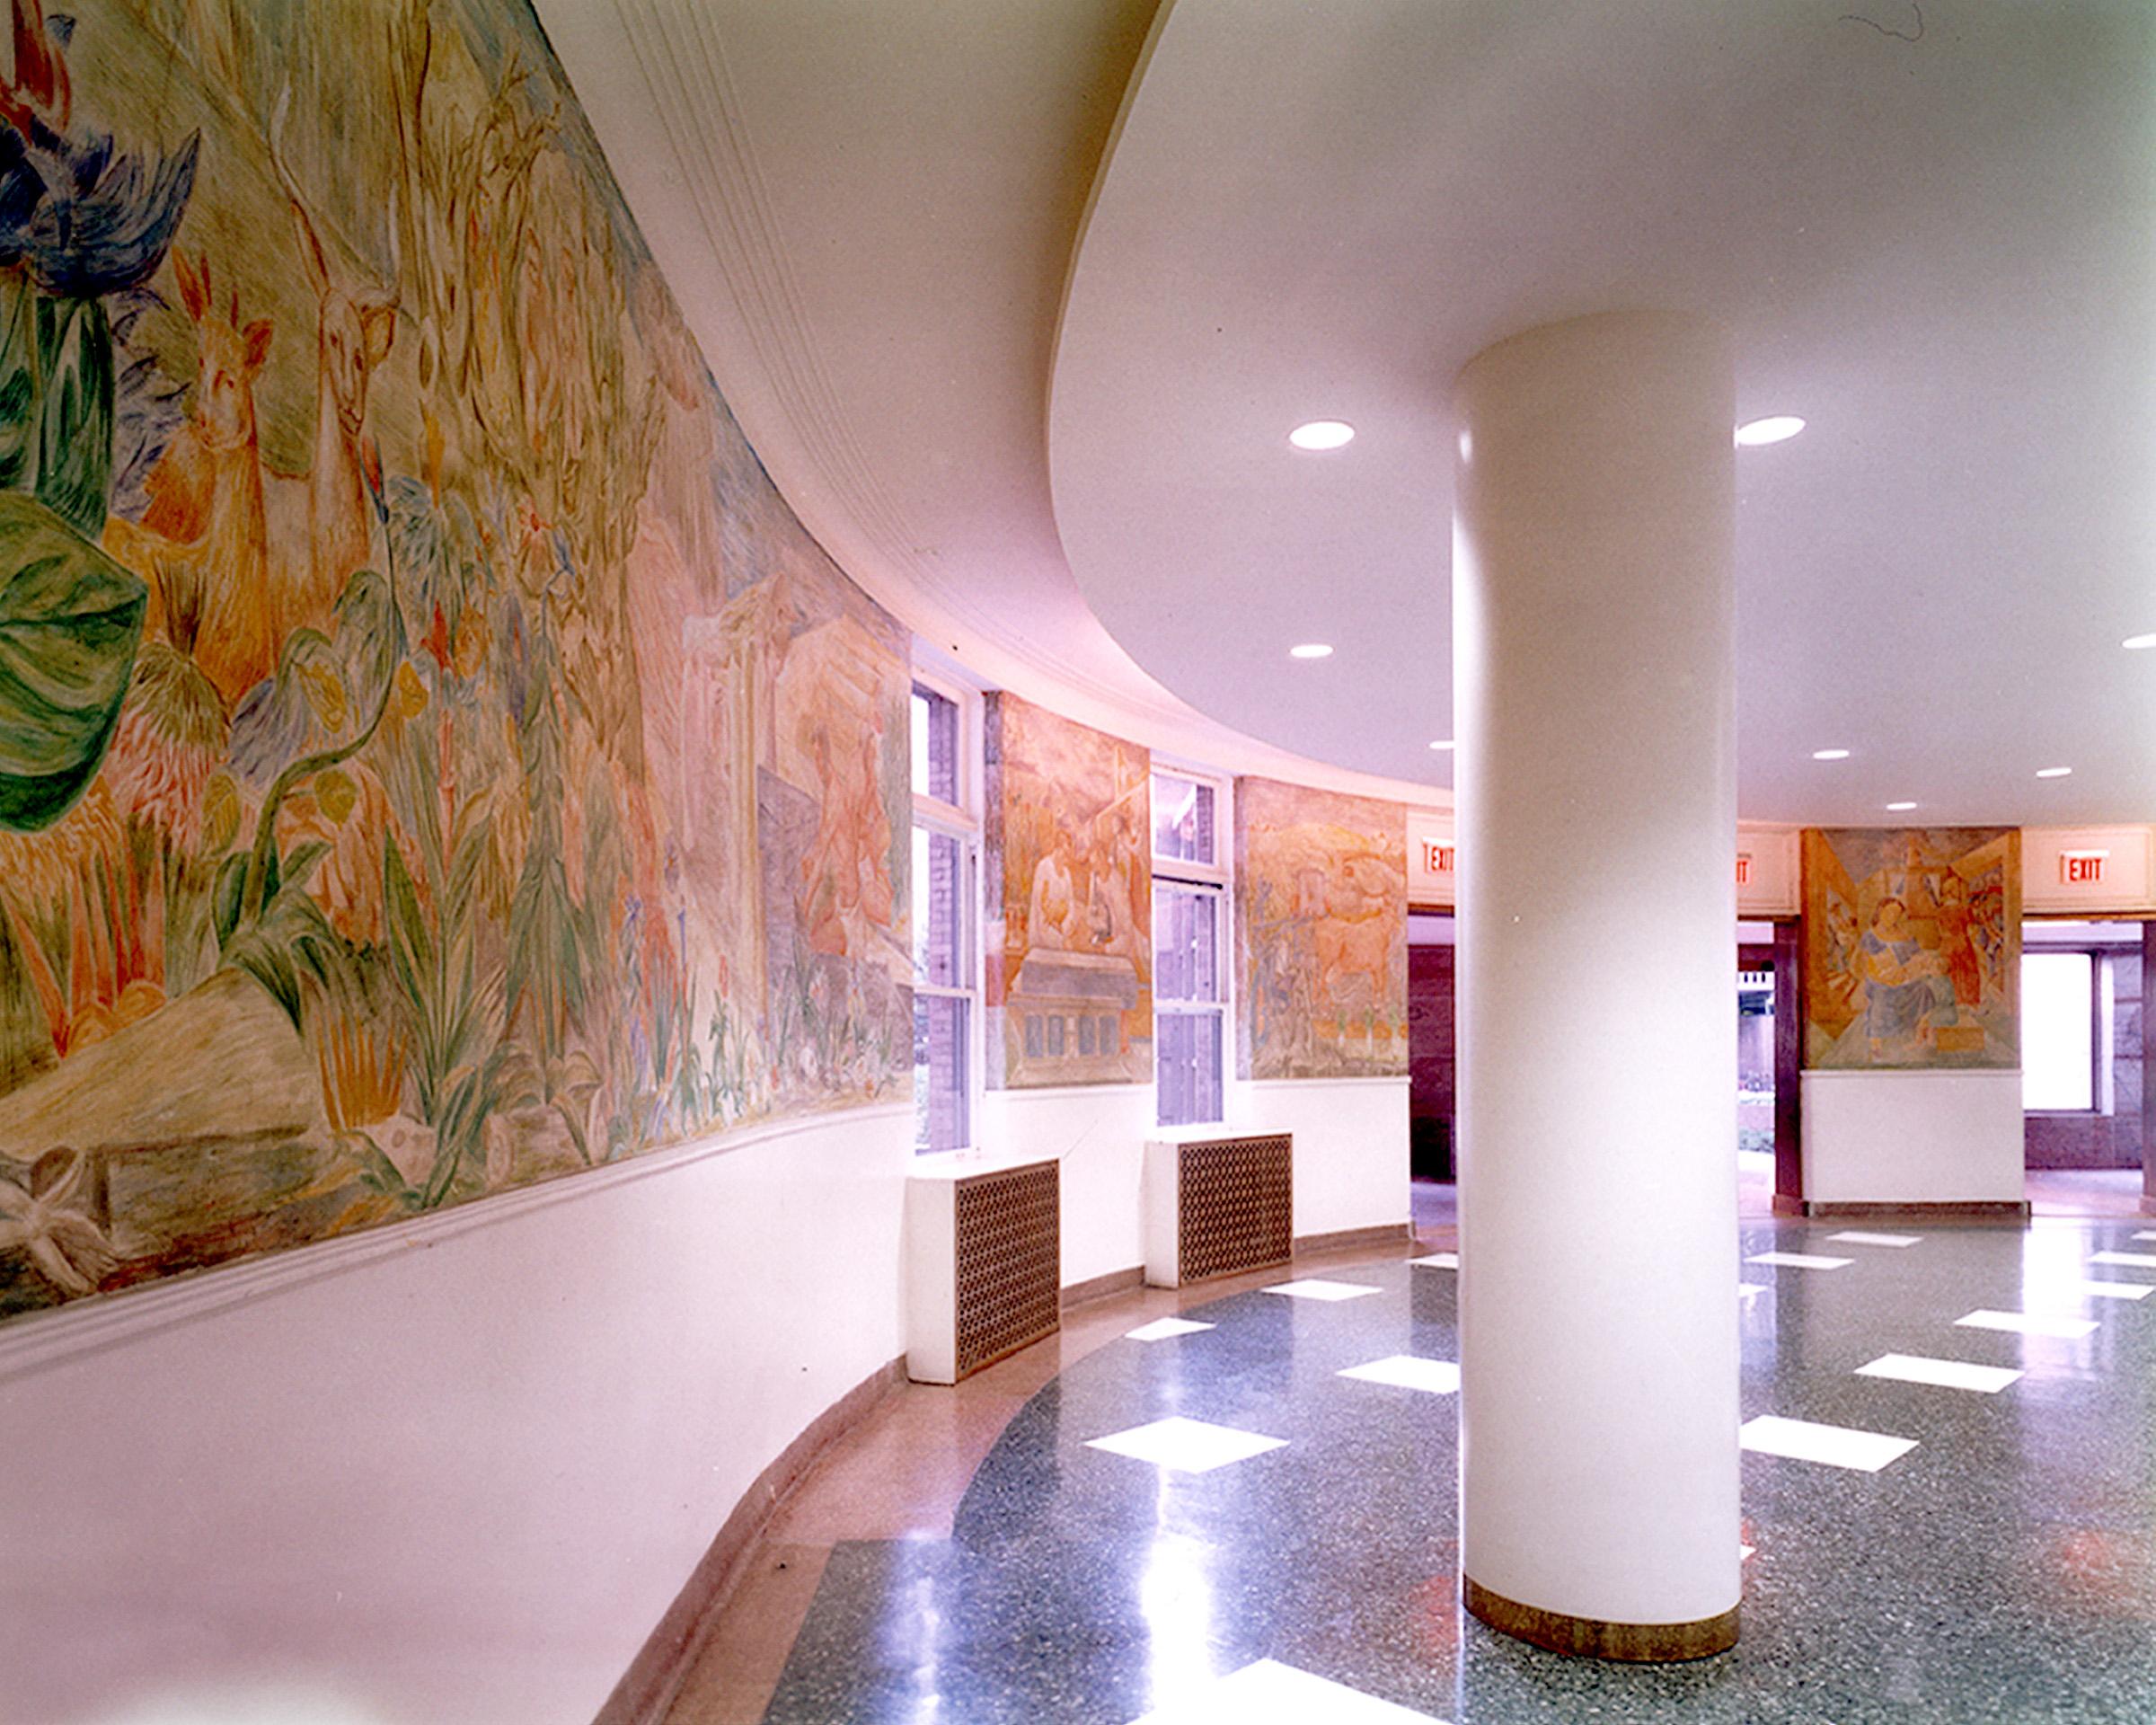 BH - New Entrance Lobby - Interior View 2.jpg